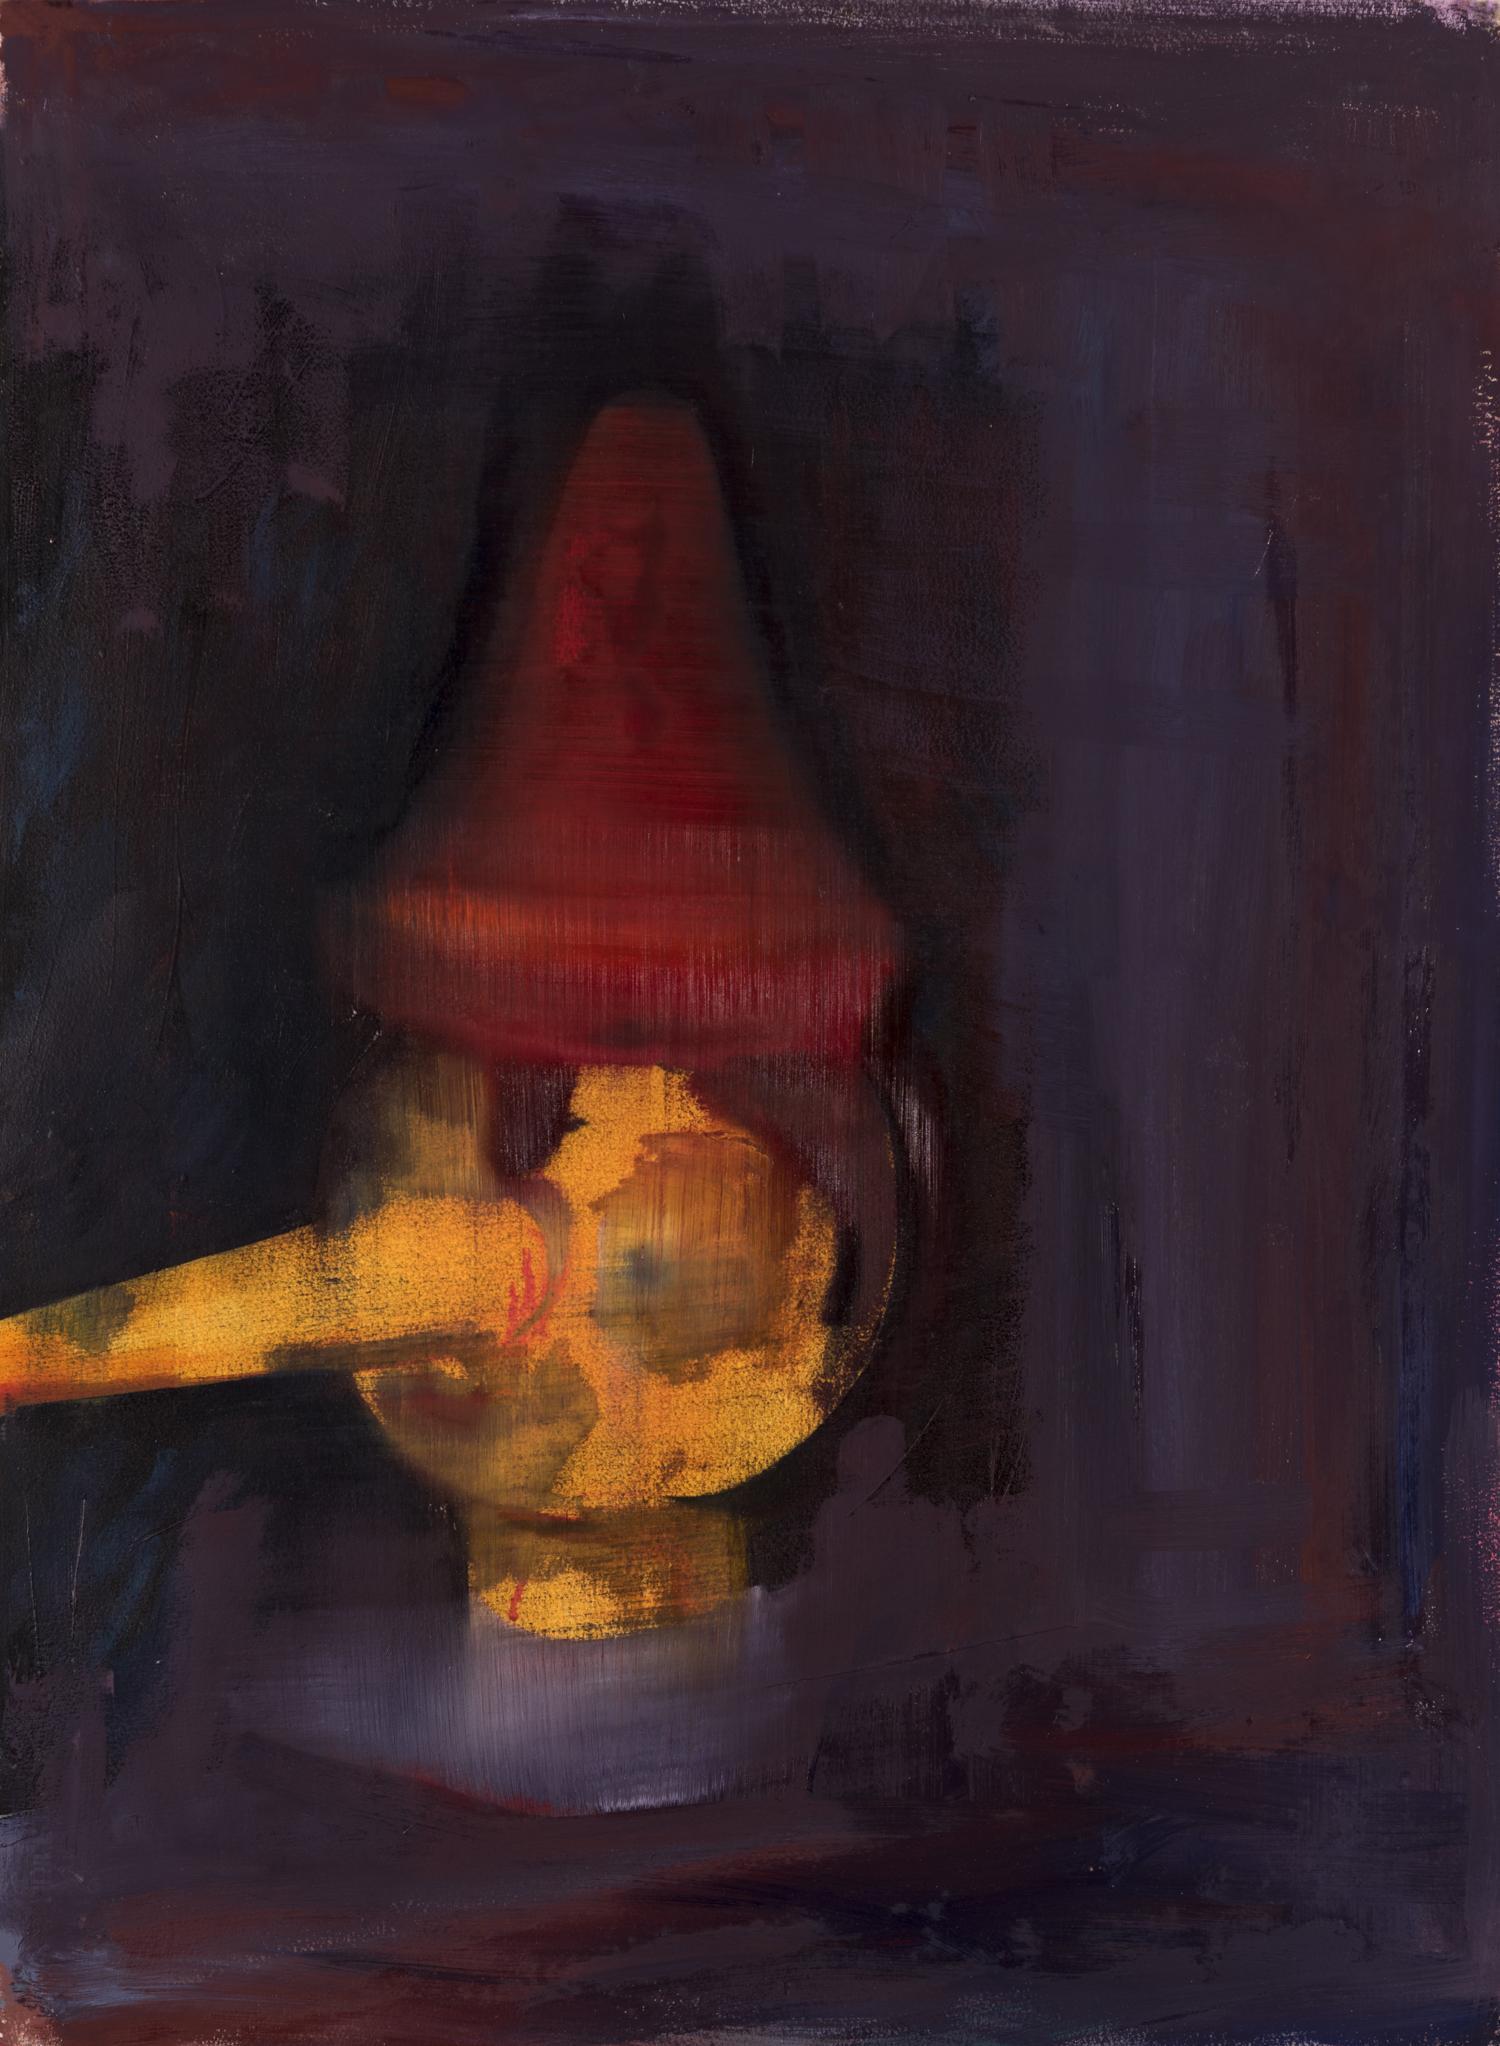 Night Portrait - Pinocchio, 2016